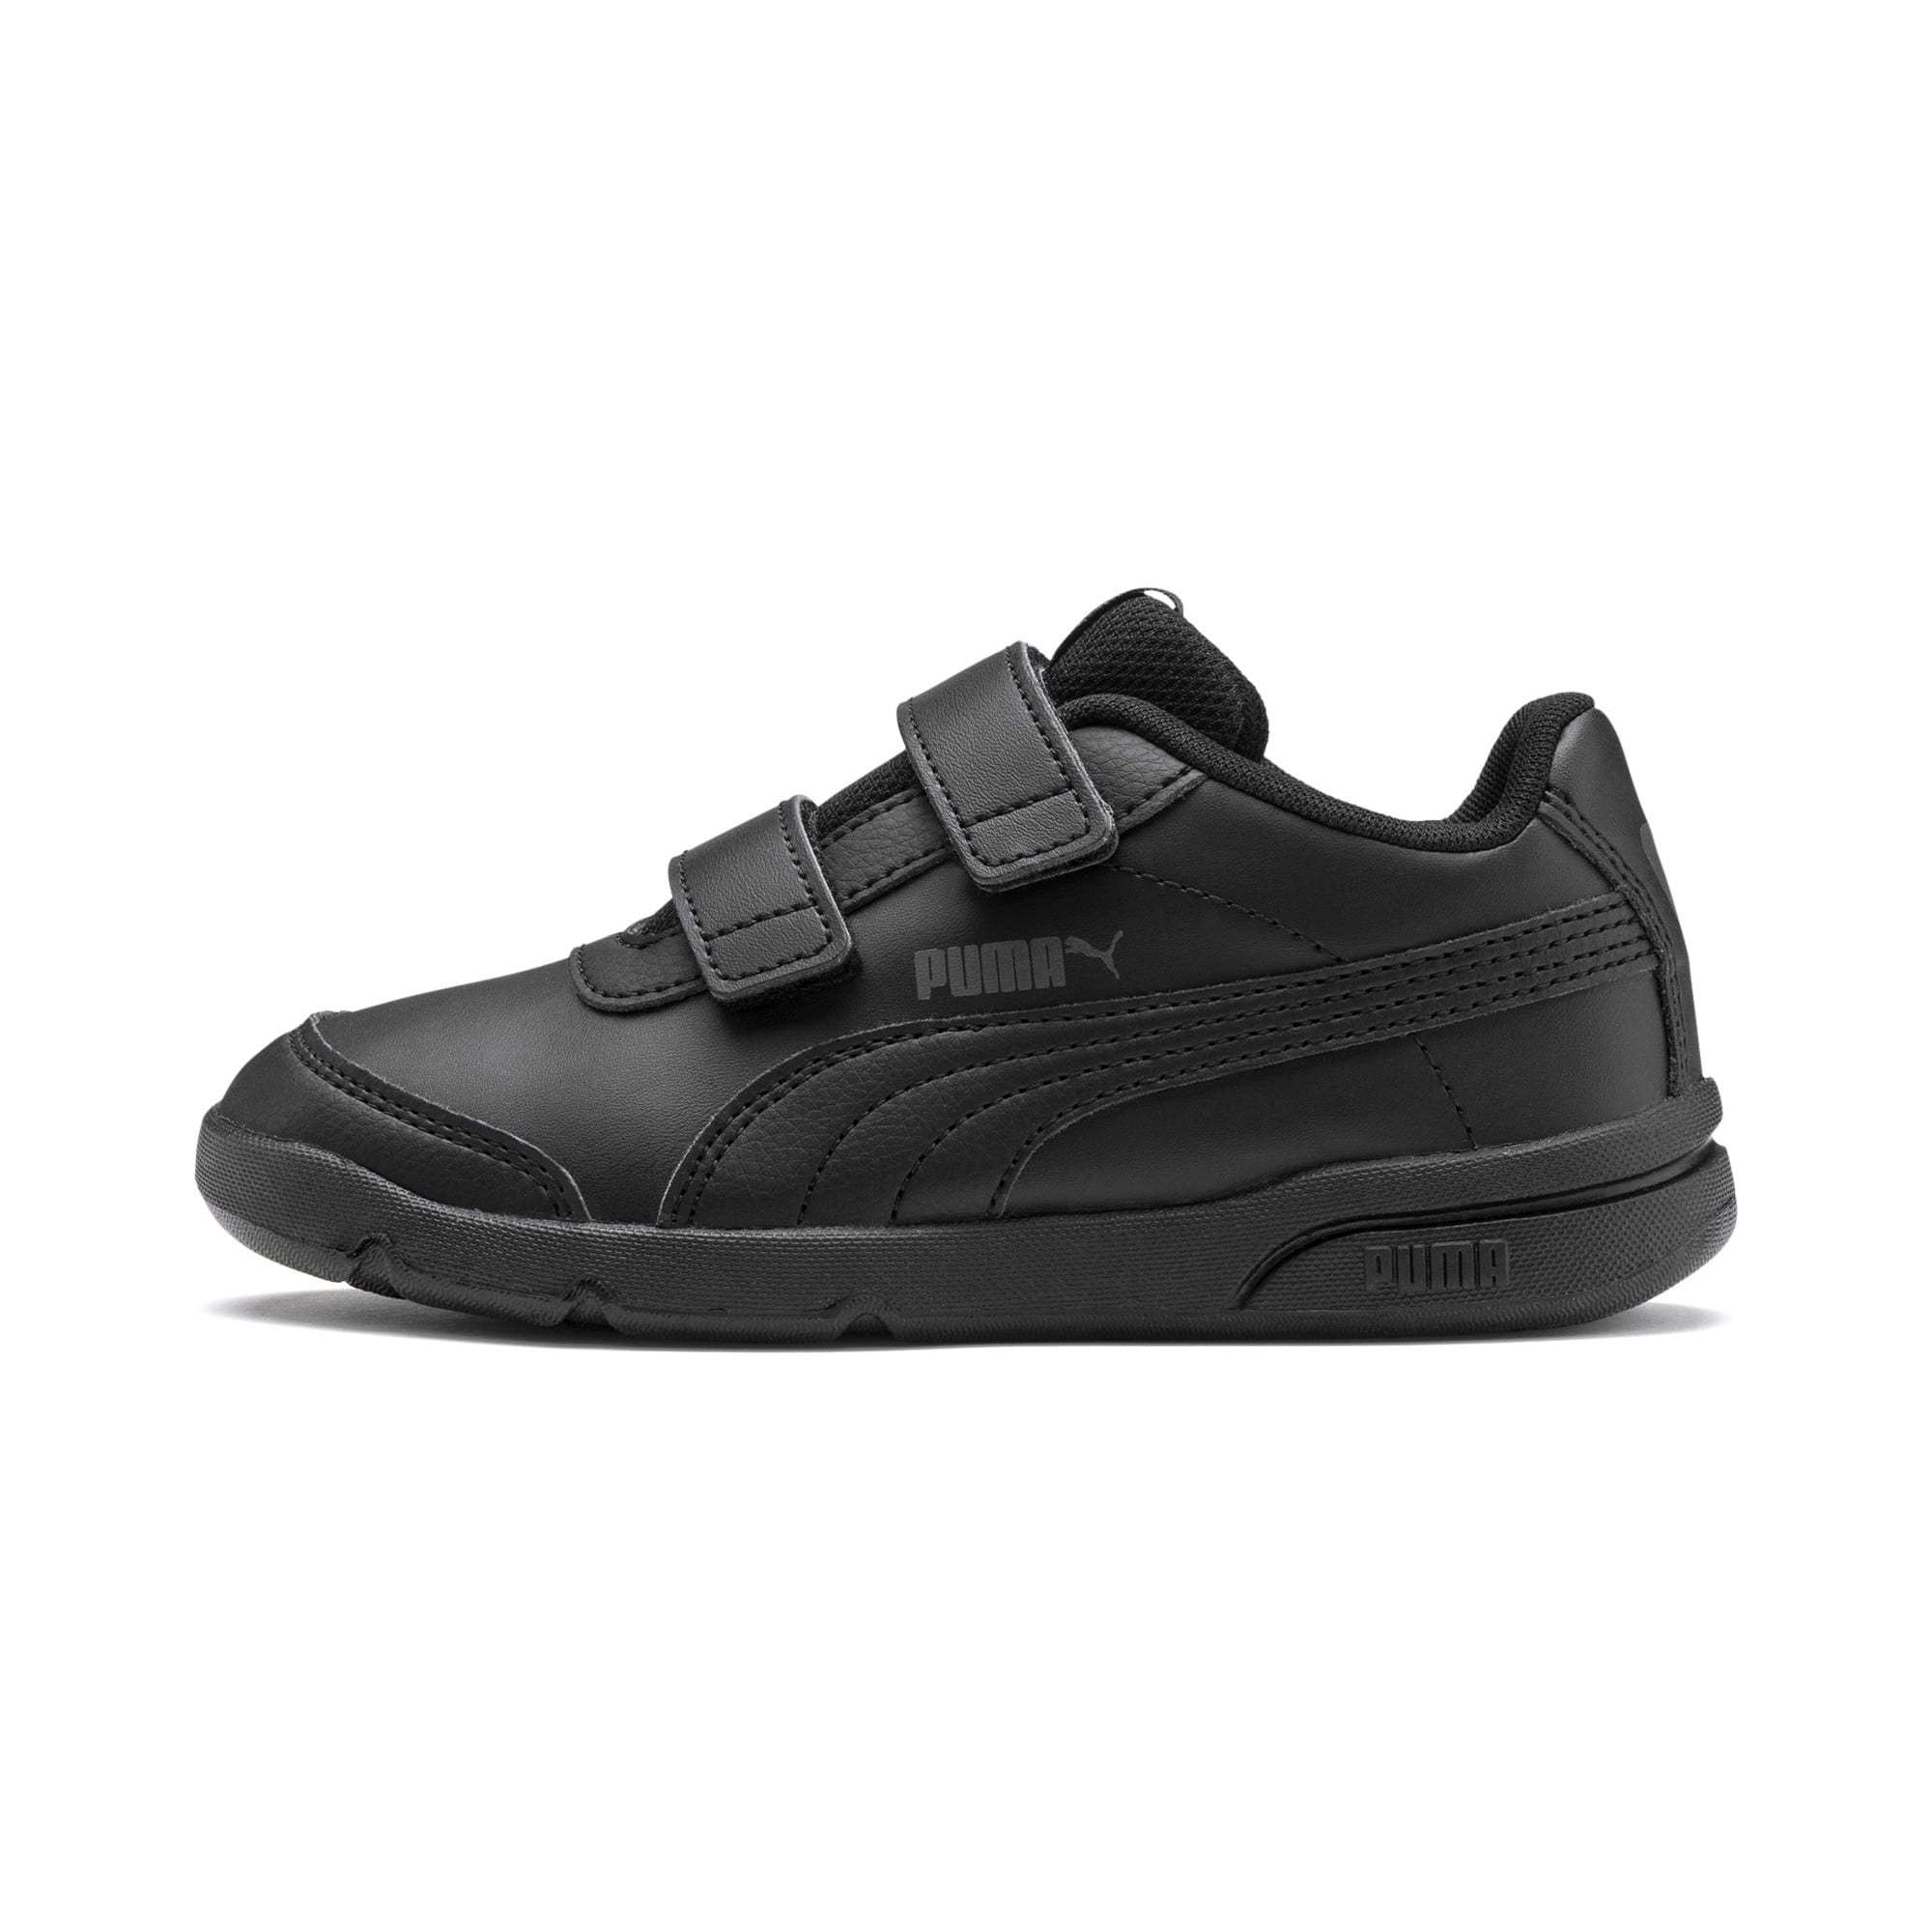 Thumbnail 1 of Stepfleex 2 SL VE V Kids Sneaker, Puma Black-Puma Black, medium